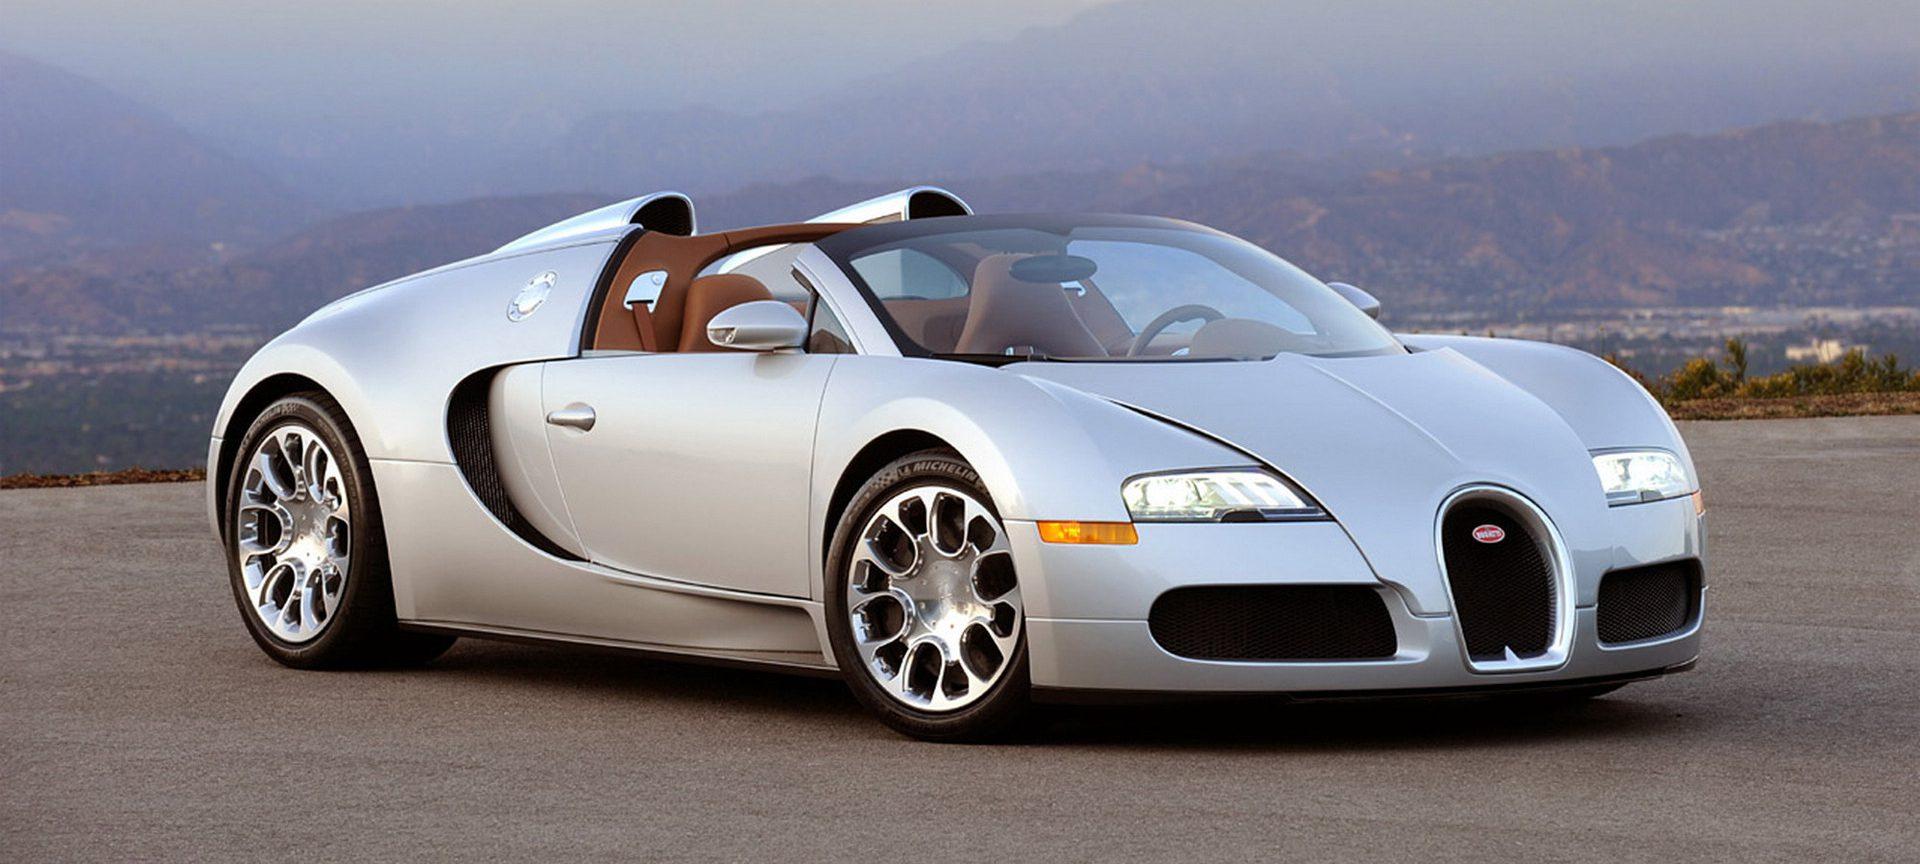 cekaja bugatti-veyron-eb-16-4-16939-1920x1200